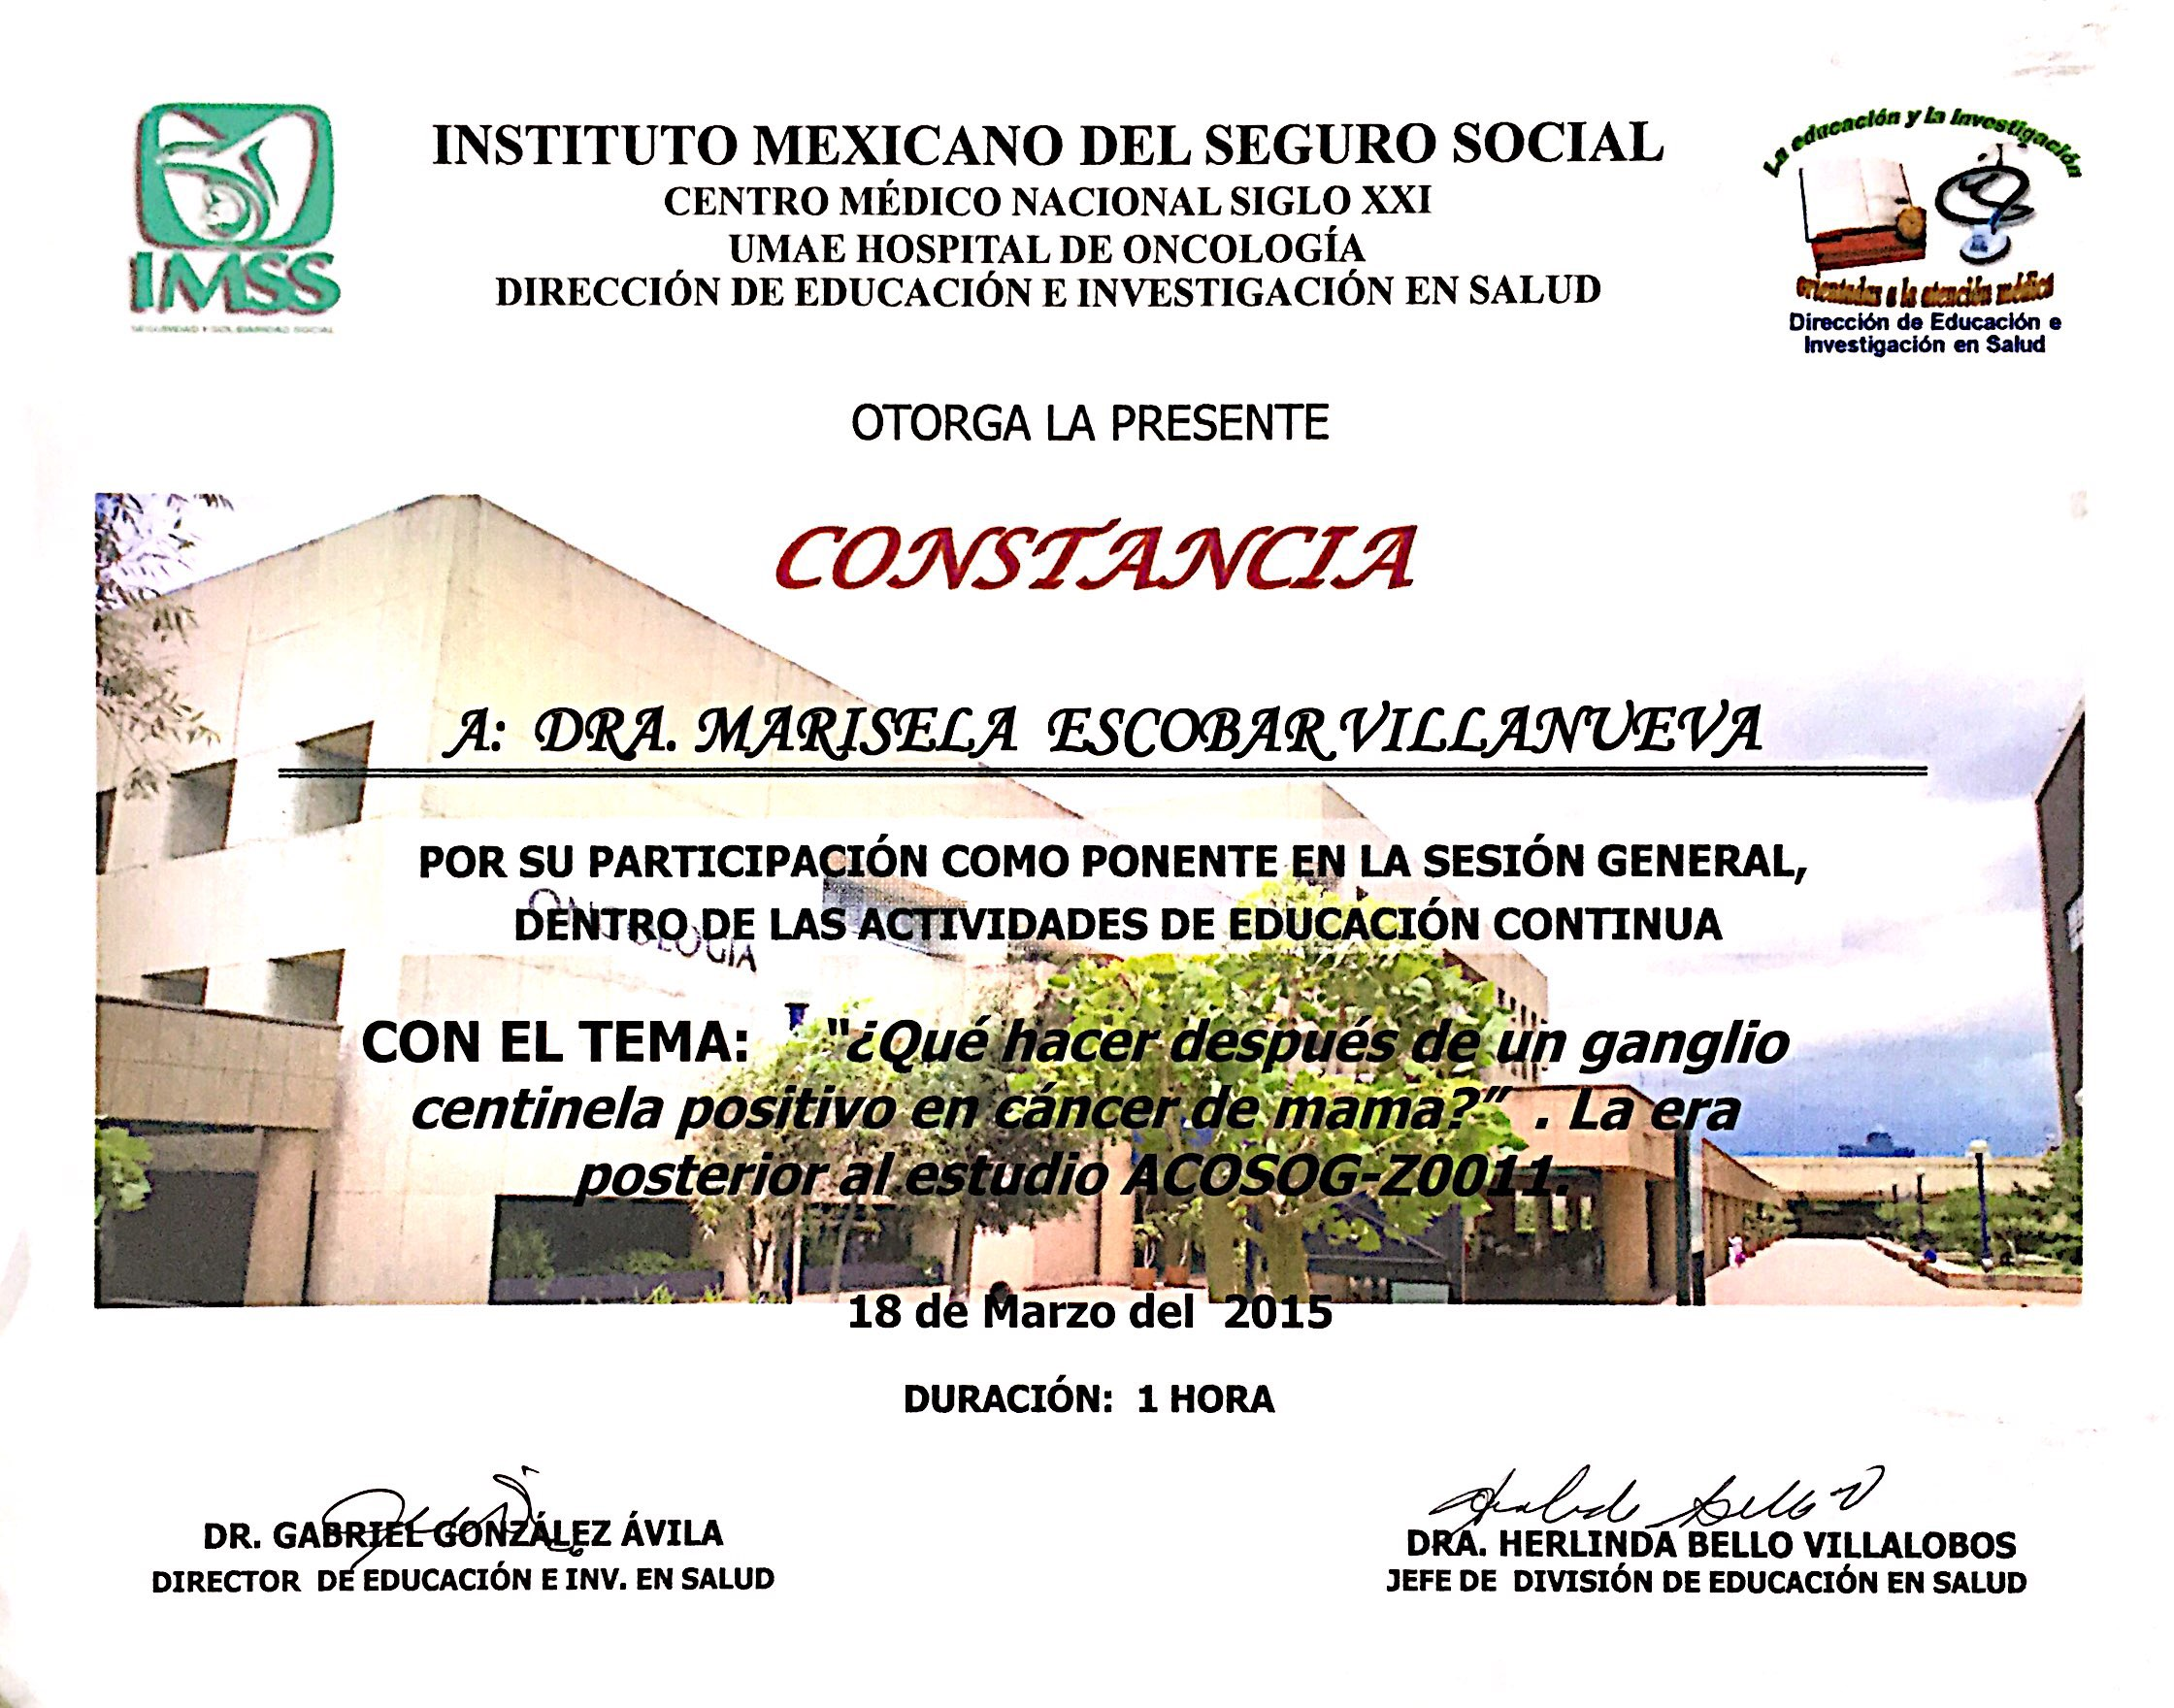 Nuevo doc 2018-02-20 11.21.39_5